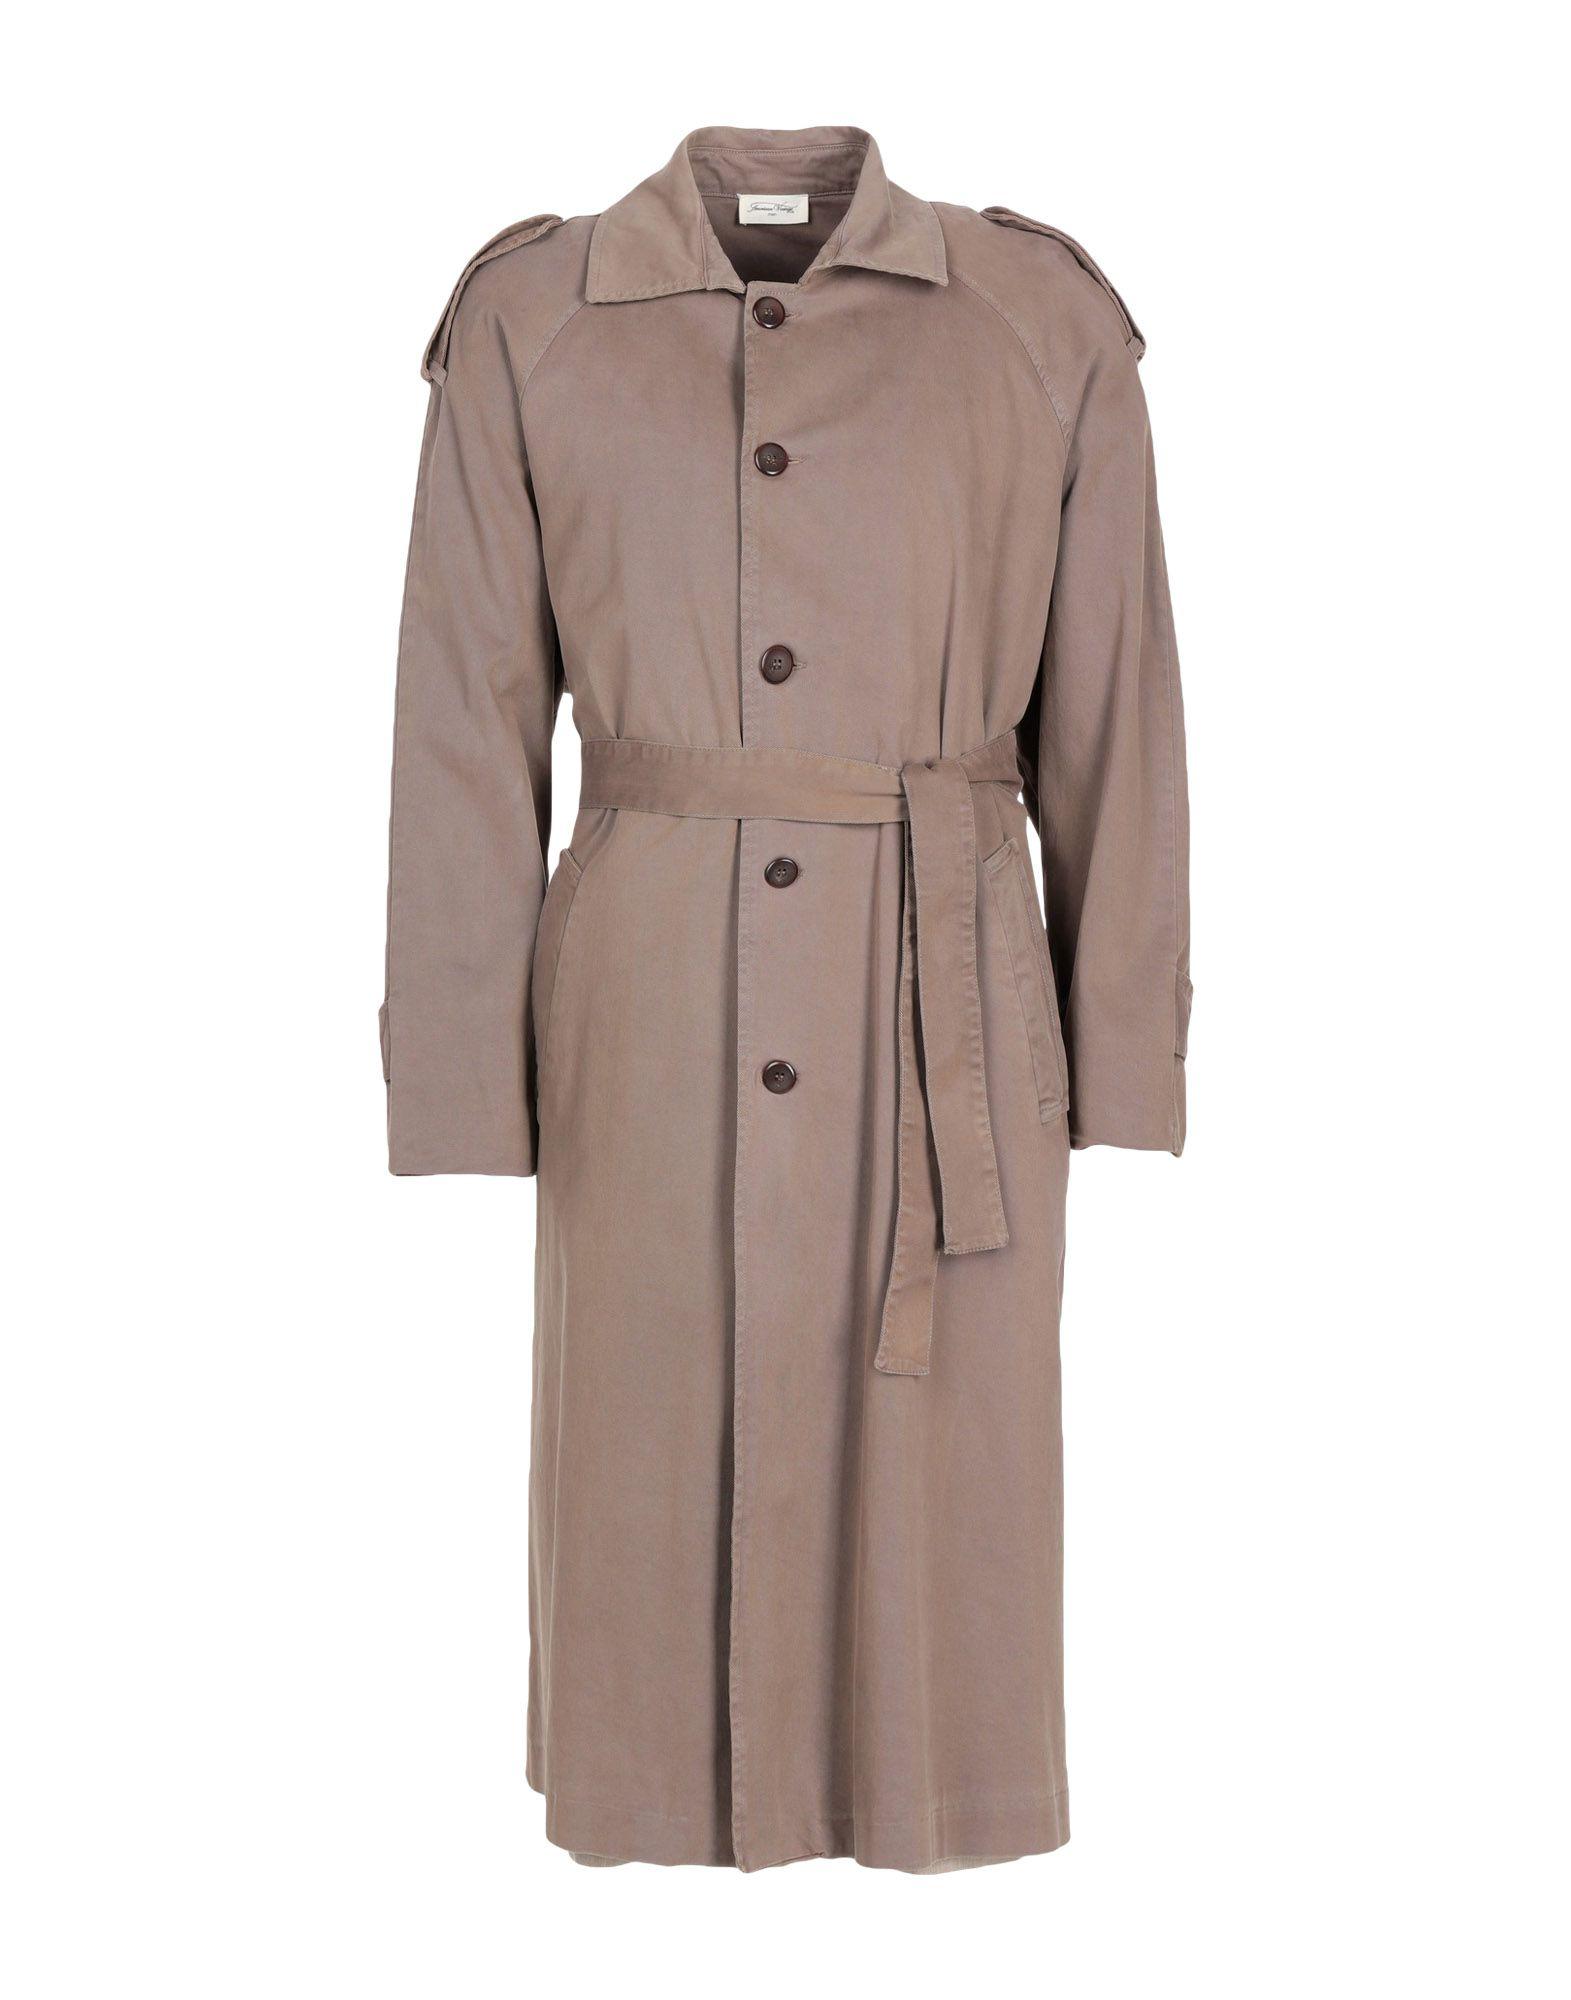 AMERICAN VINTAGE Full-Length Jacket in Khaki